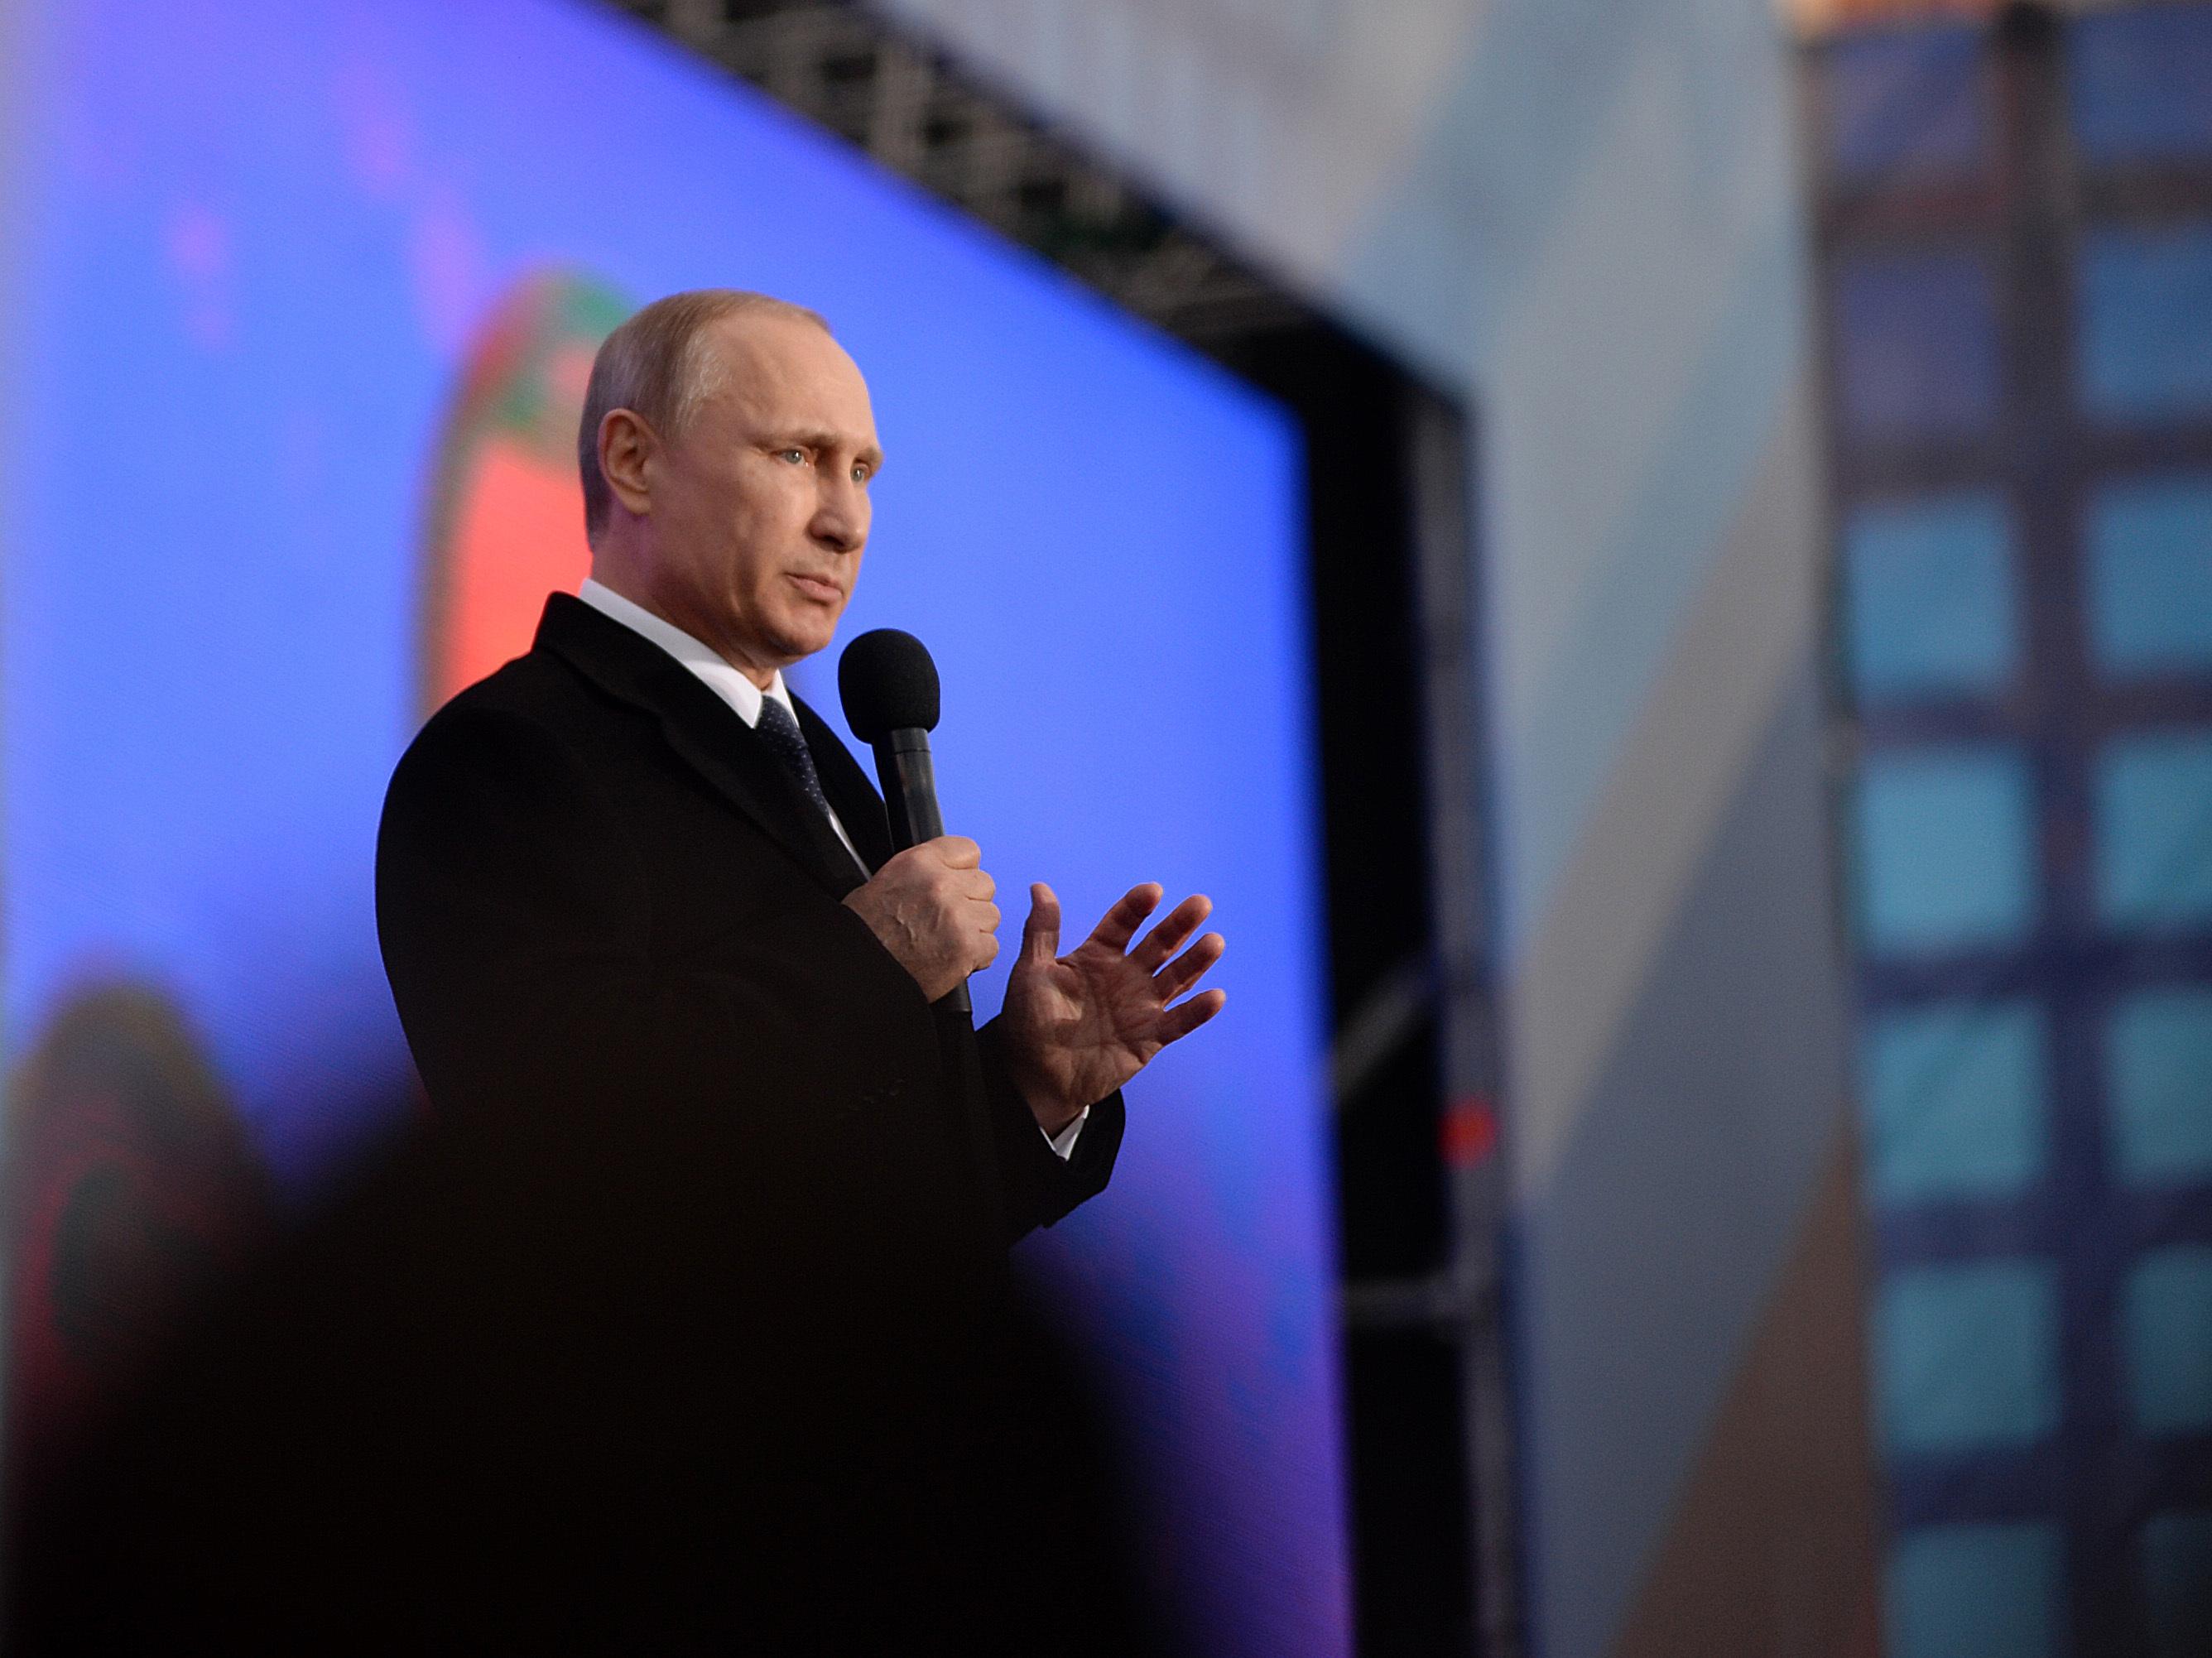 Putin: 'No Regrets' Over Crimea Annexation